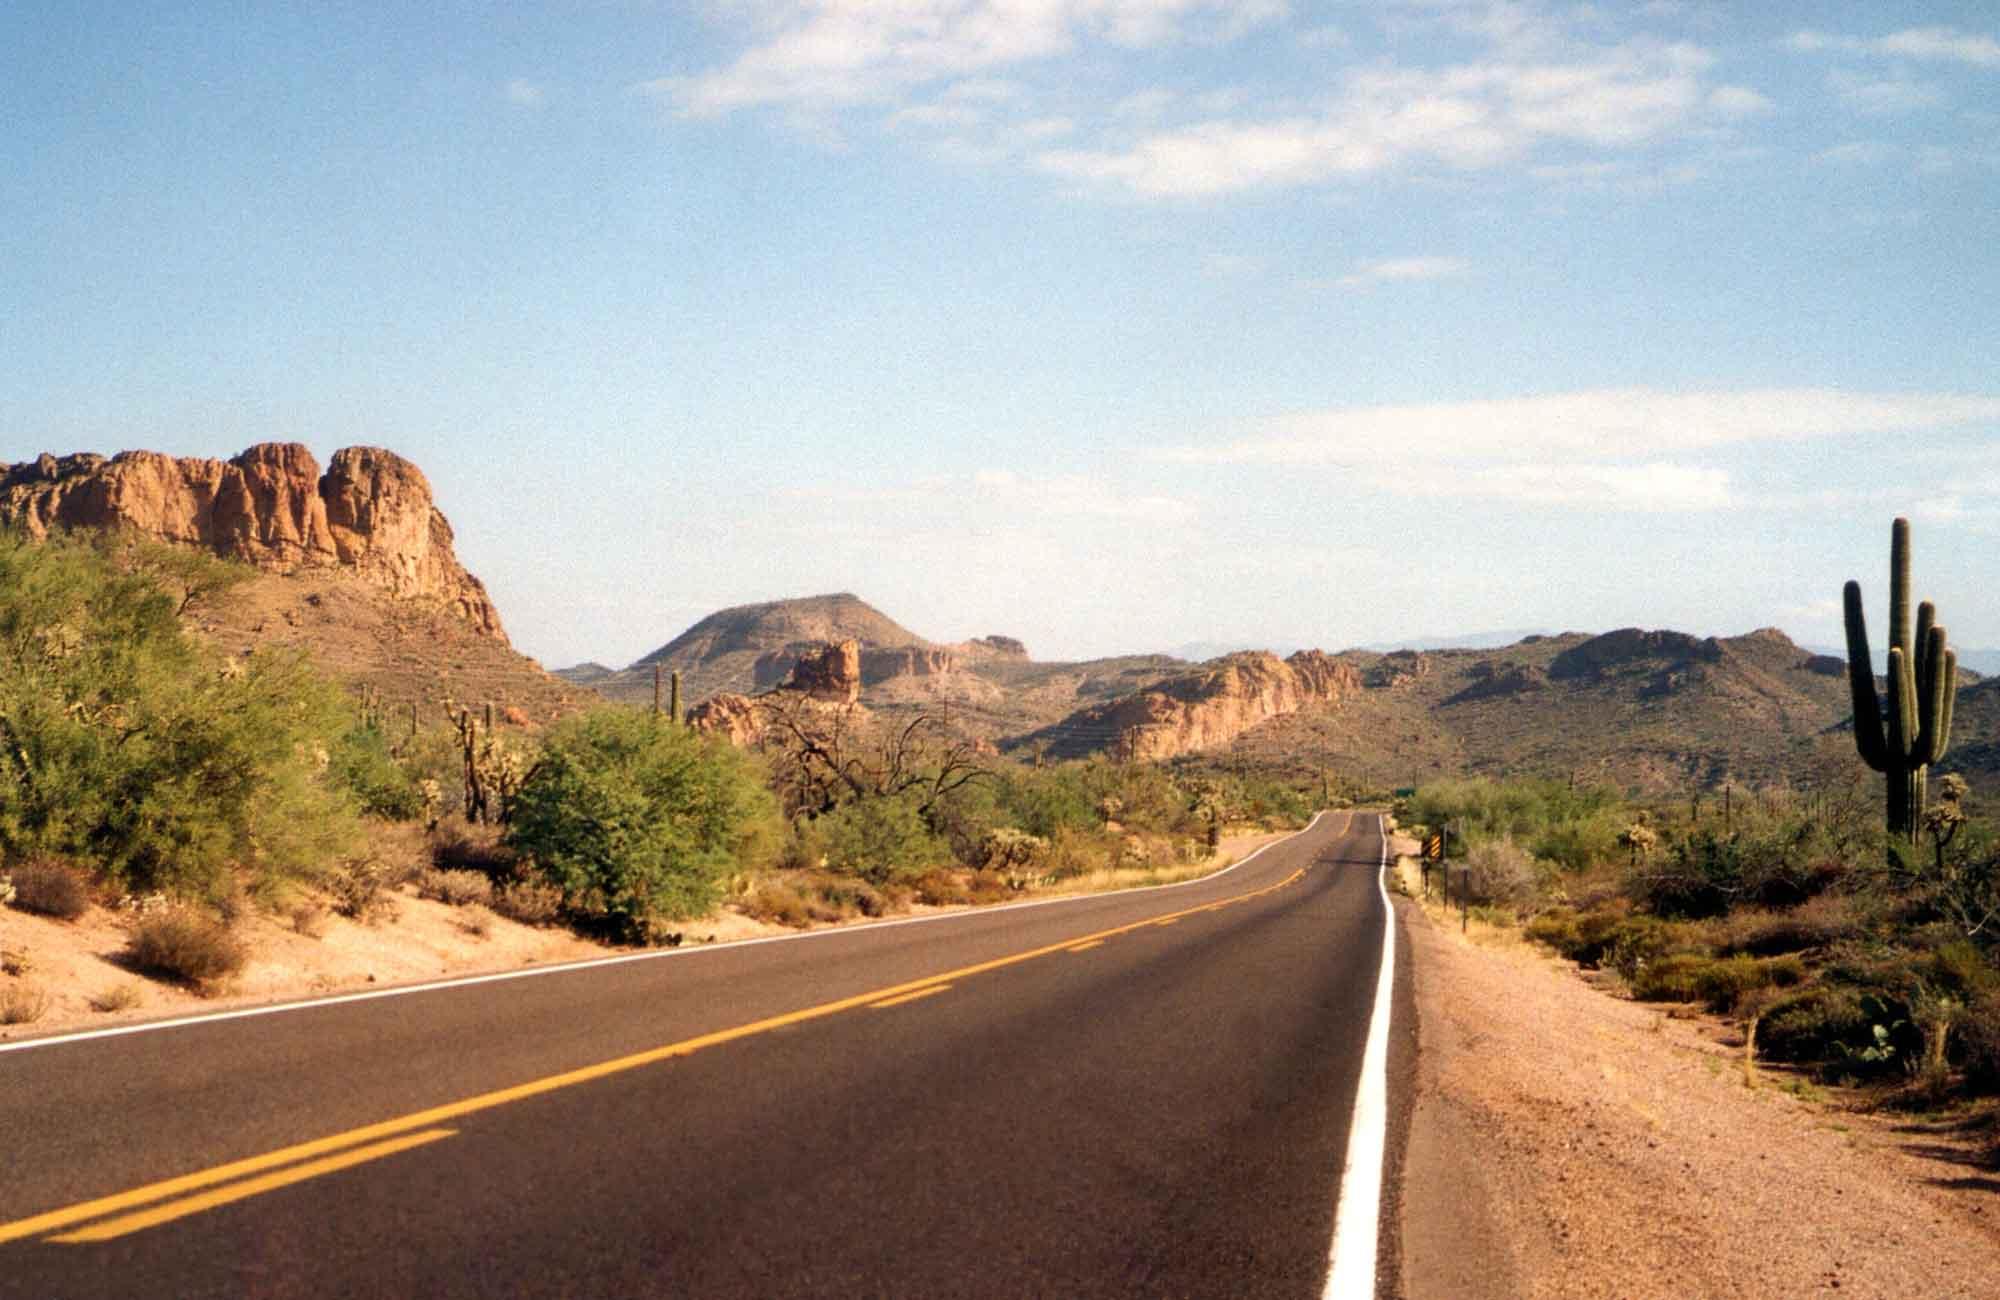 Voyage Etats-Unis - Arizona-apache-trail - Amplitudes